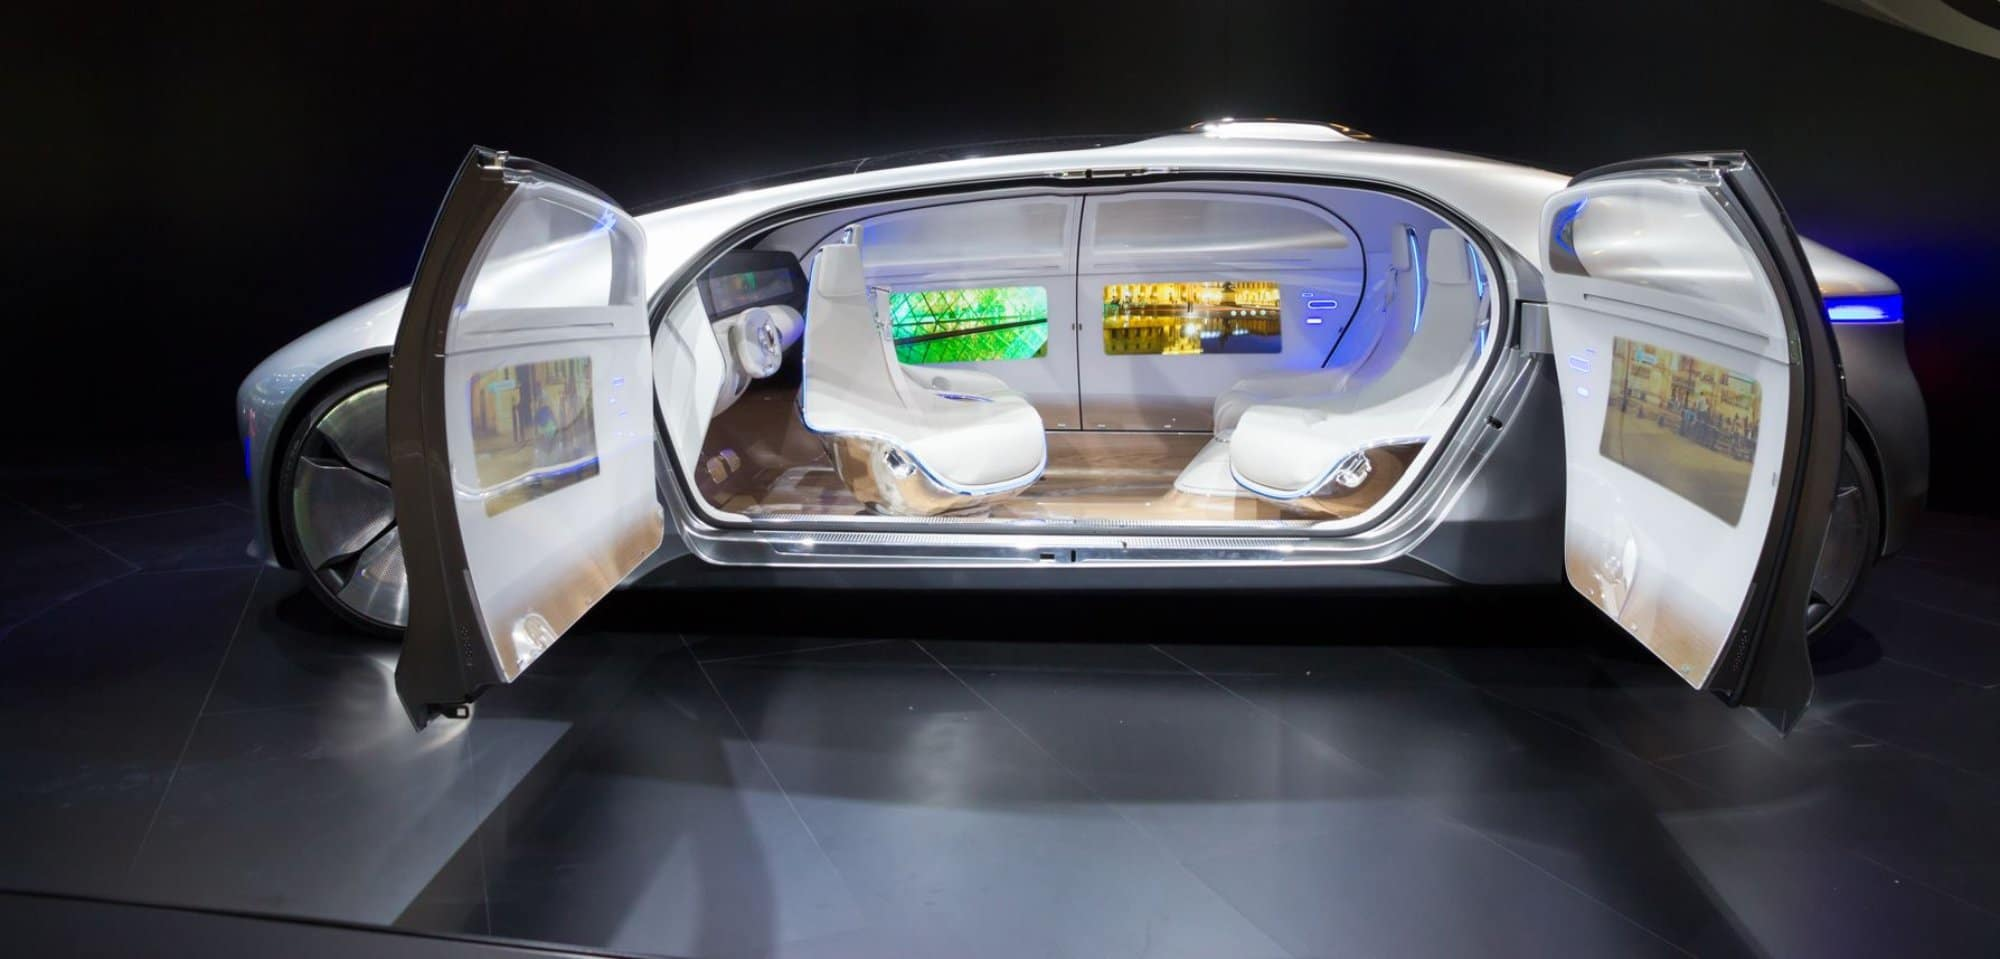 nissan seeks autonomous vehicle patents in india electronicsb2b. Black Bedroom Furniture Sets. Home Design Ideas